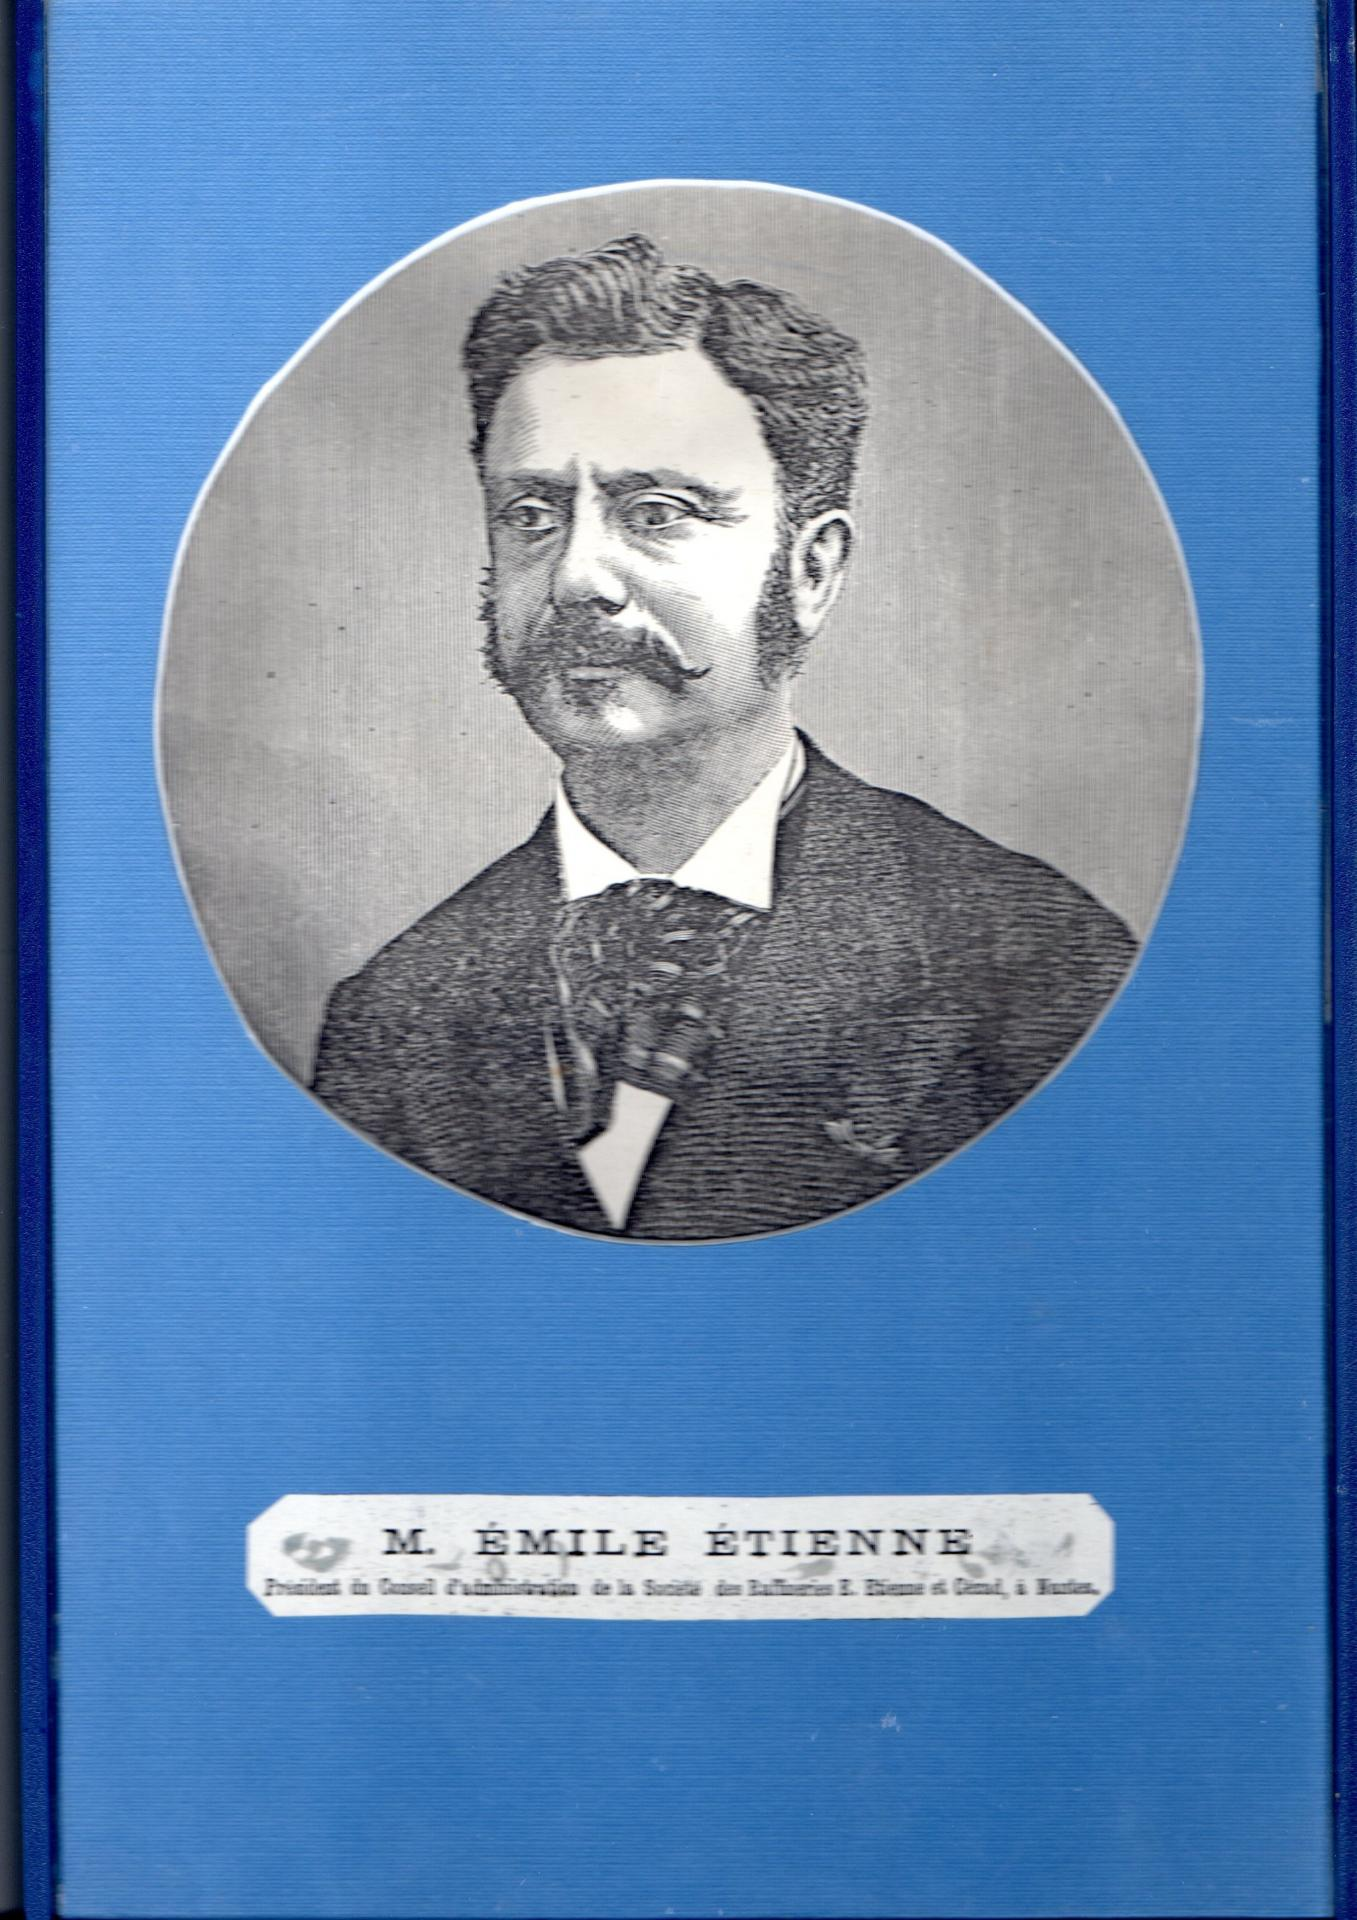 Emile Etienne